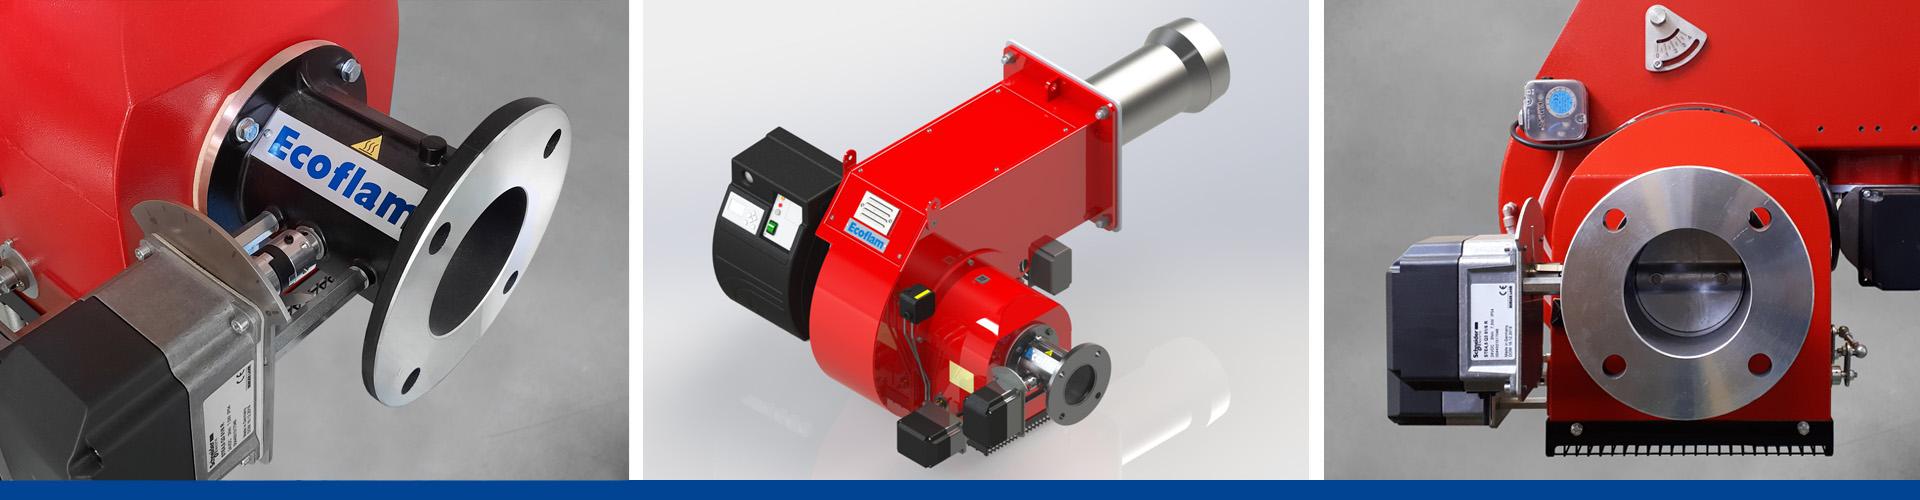 Ecoflam Combustion technologies